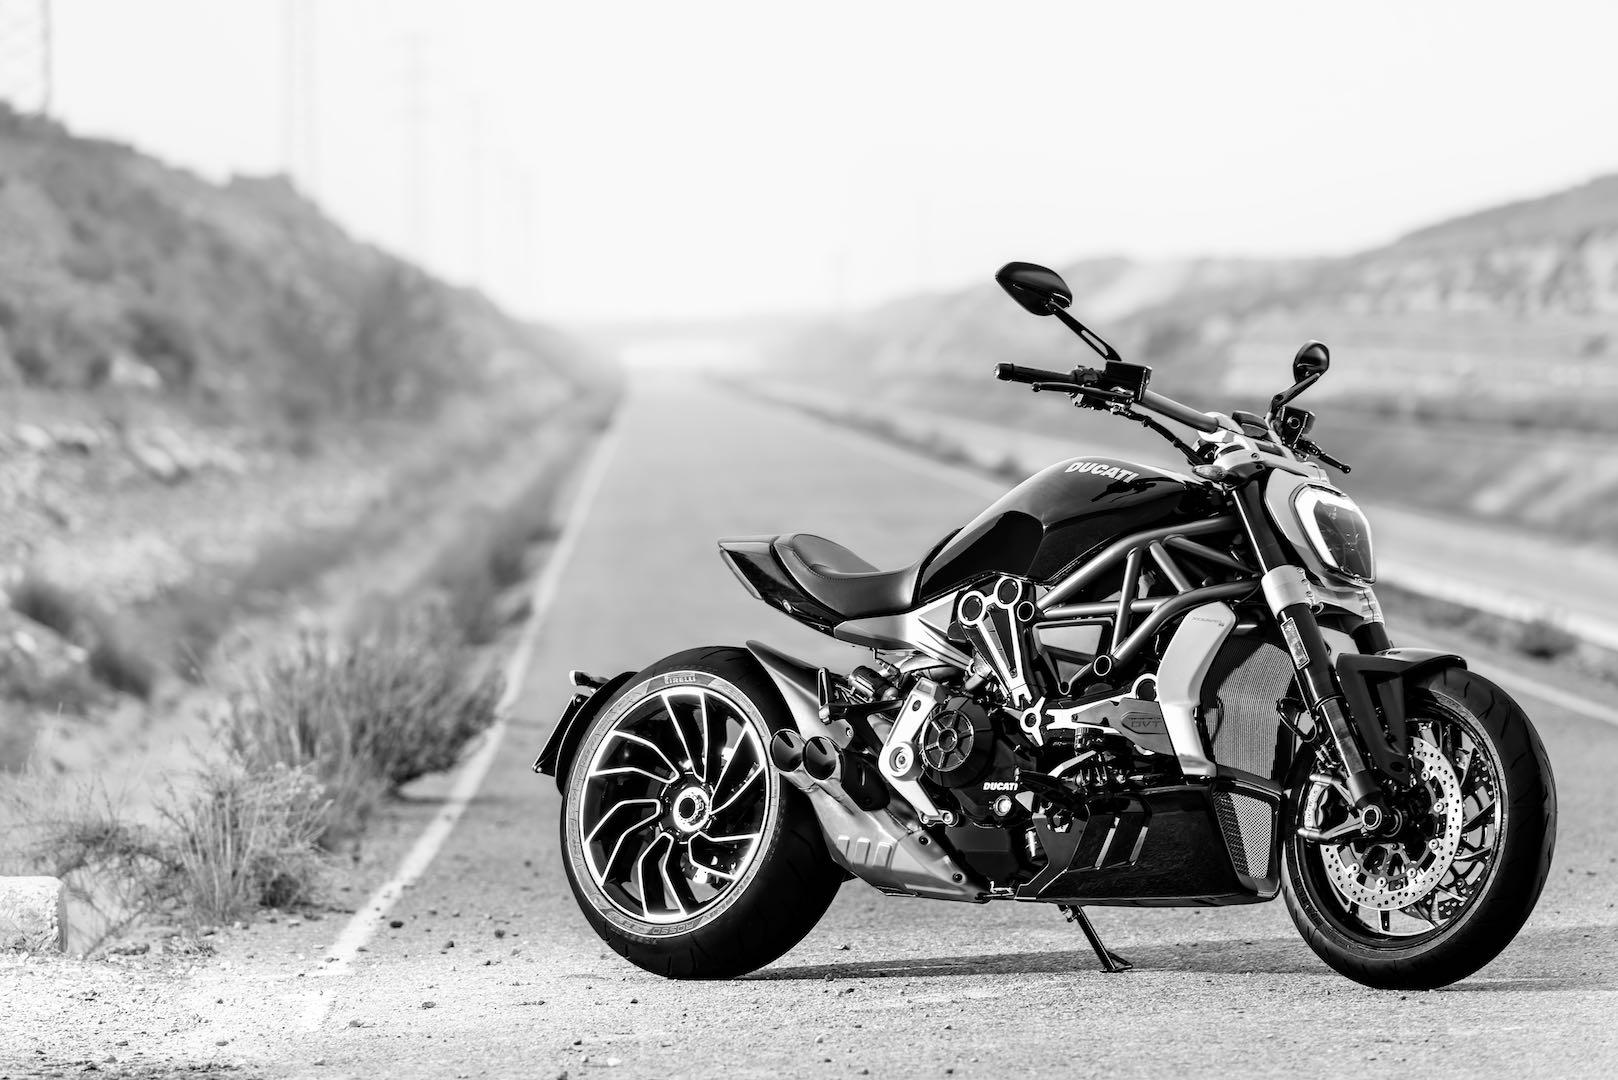 Ducati XDiavel S Claims 'Good Design Award 2016' in New York